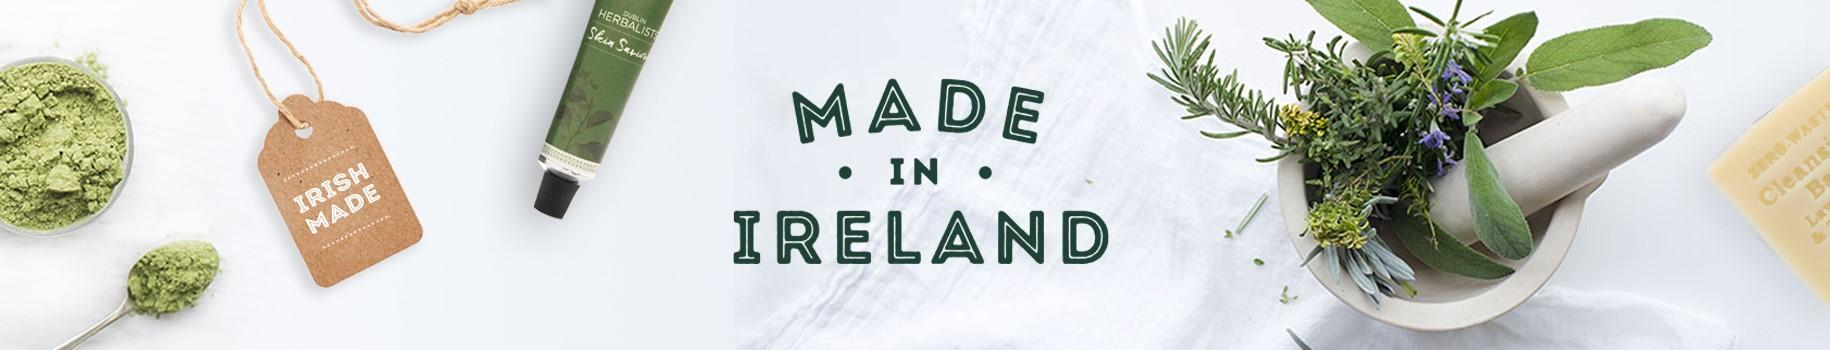 Nourish Made in Ireland - Skincare